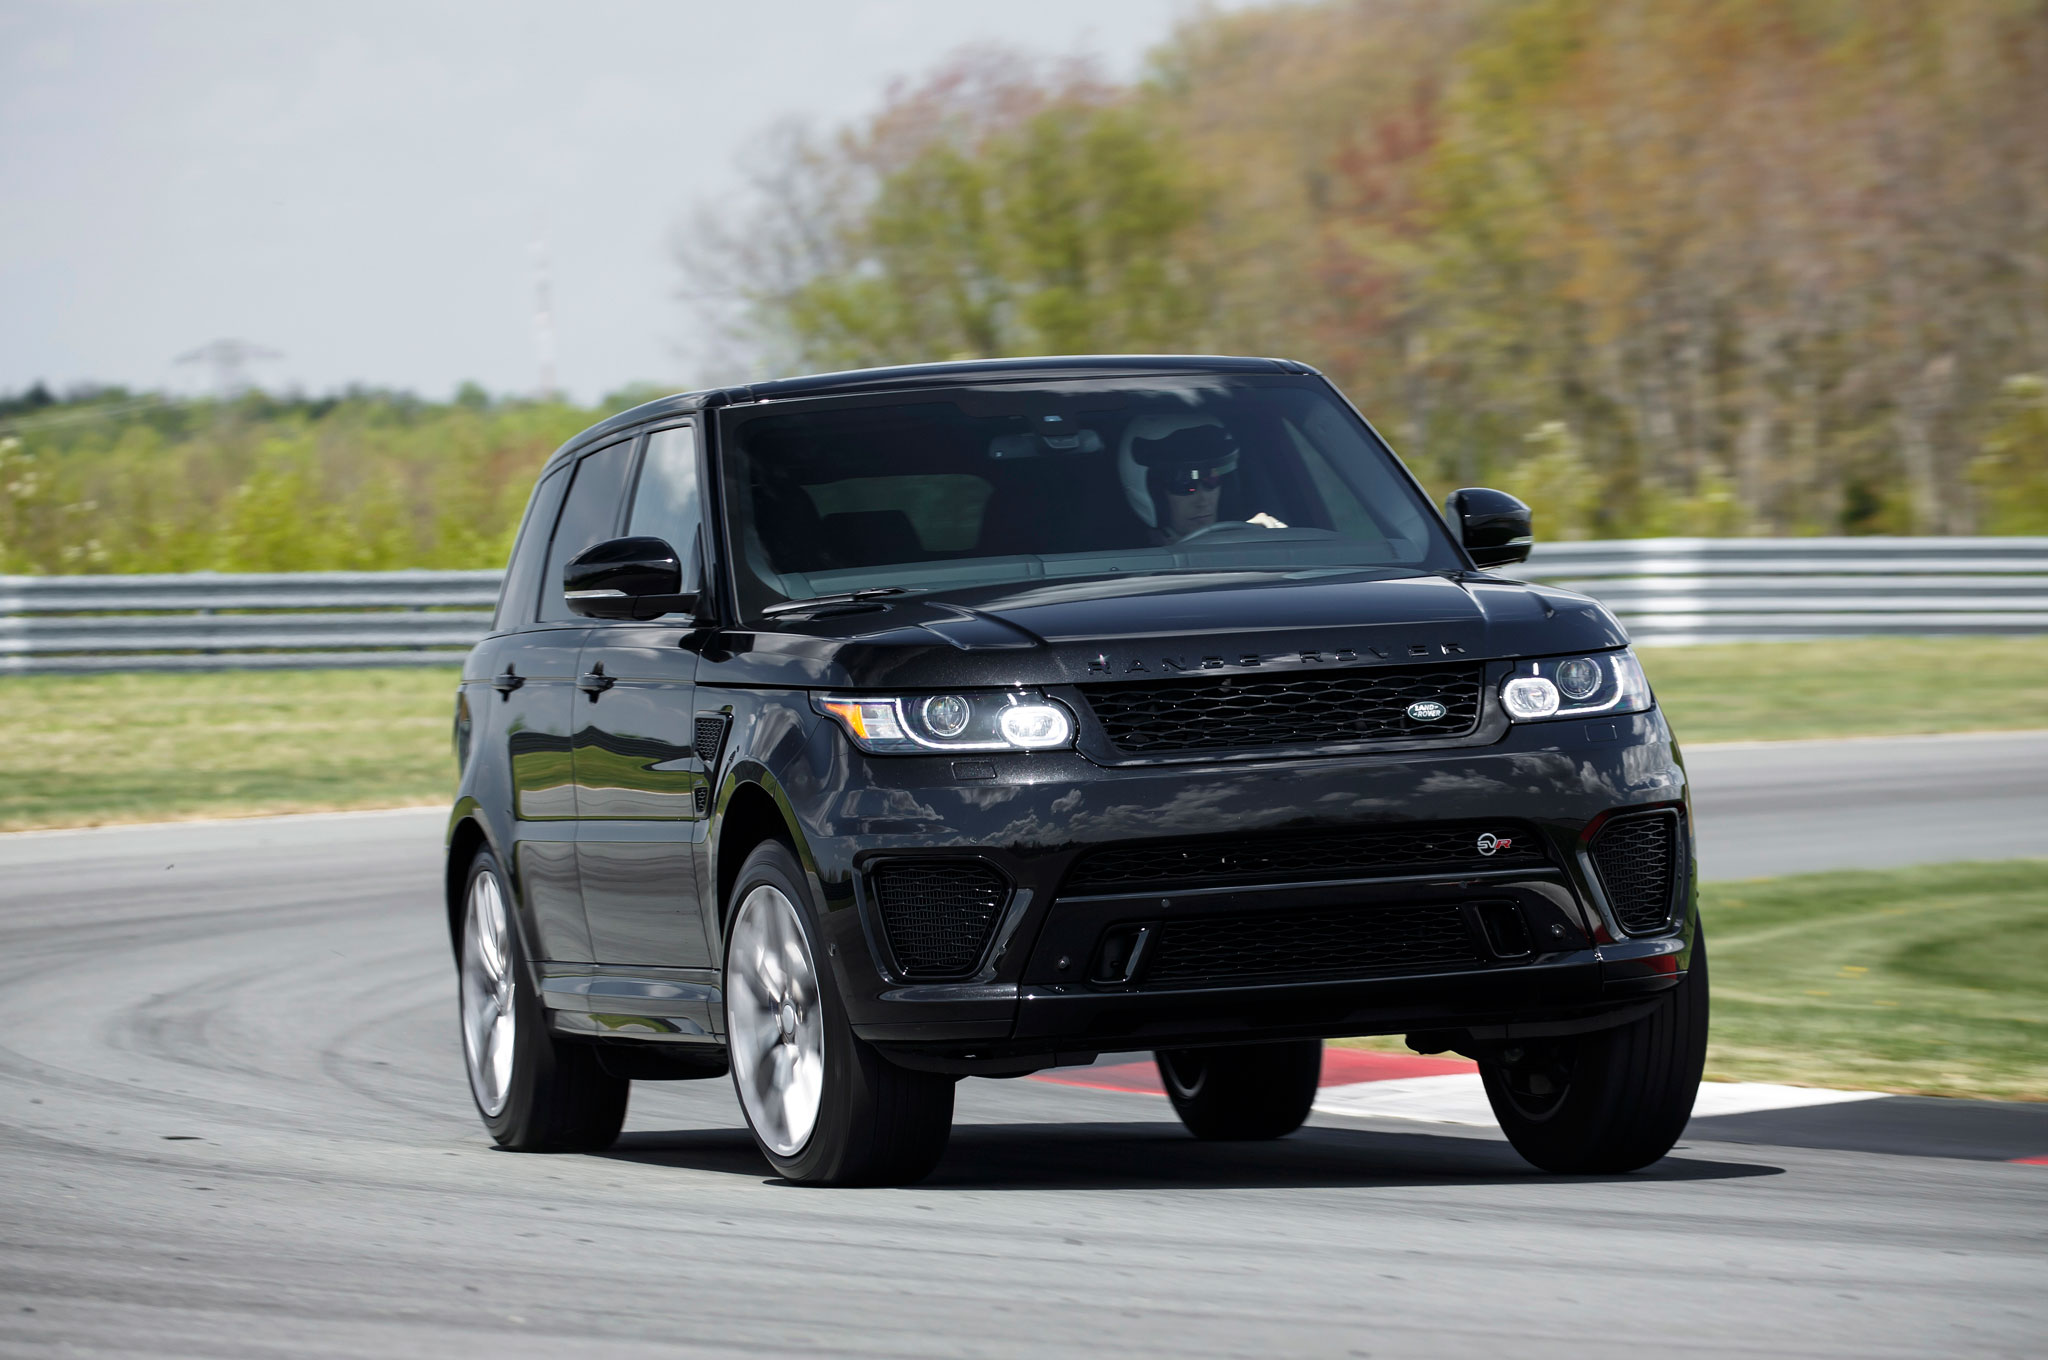 https://st.automobilemag.com/uploads/sites/11/2015/05/2015-Land-Rover-Range-Rover-Sport-SVR-front-three-quarter-in-motion-07.jpg